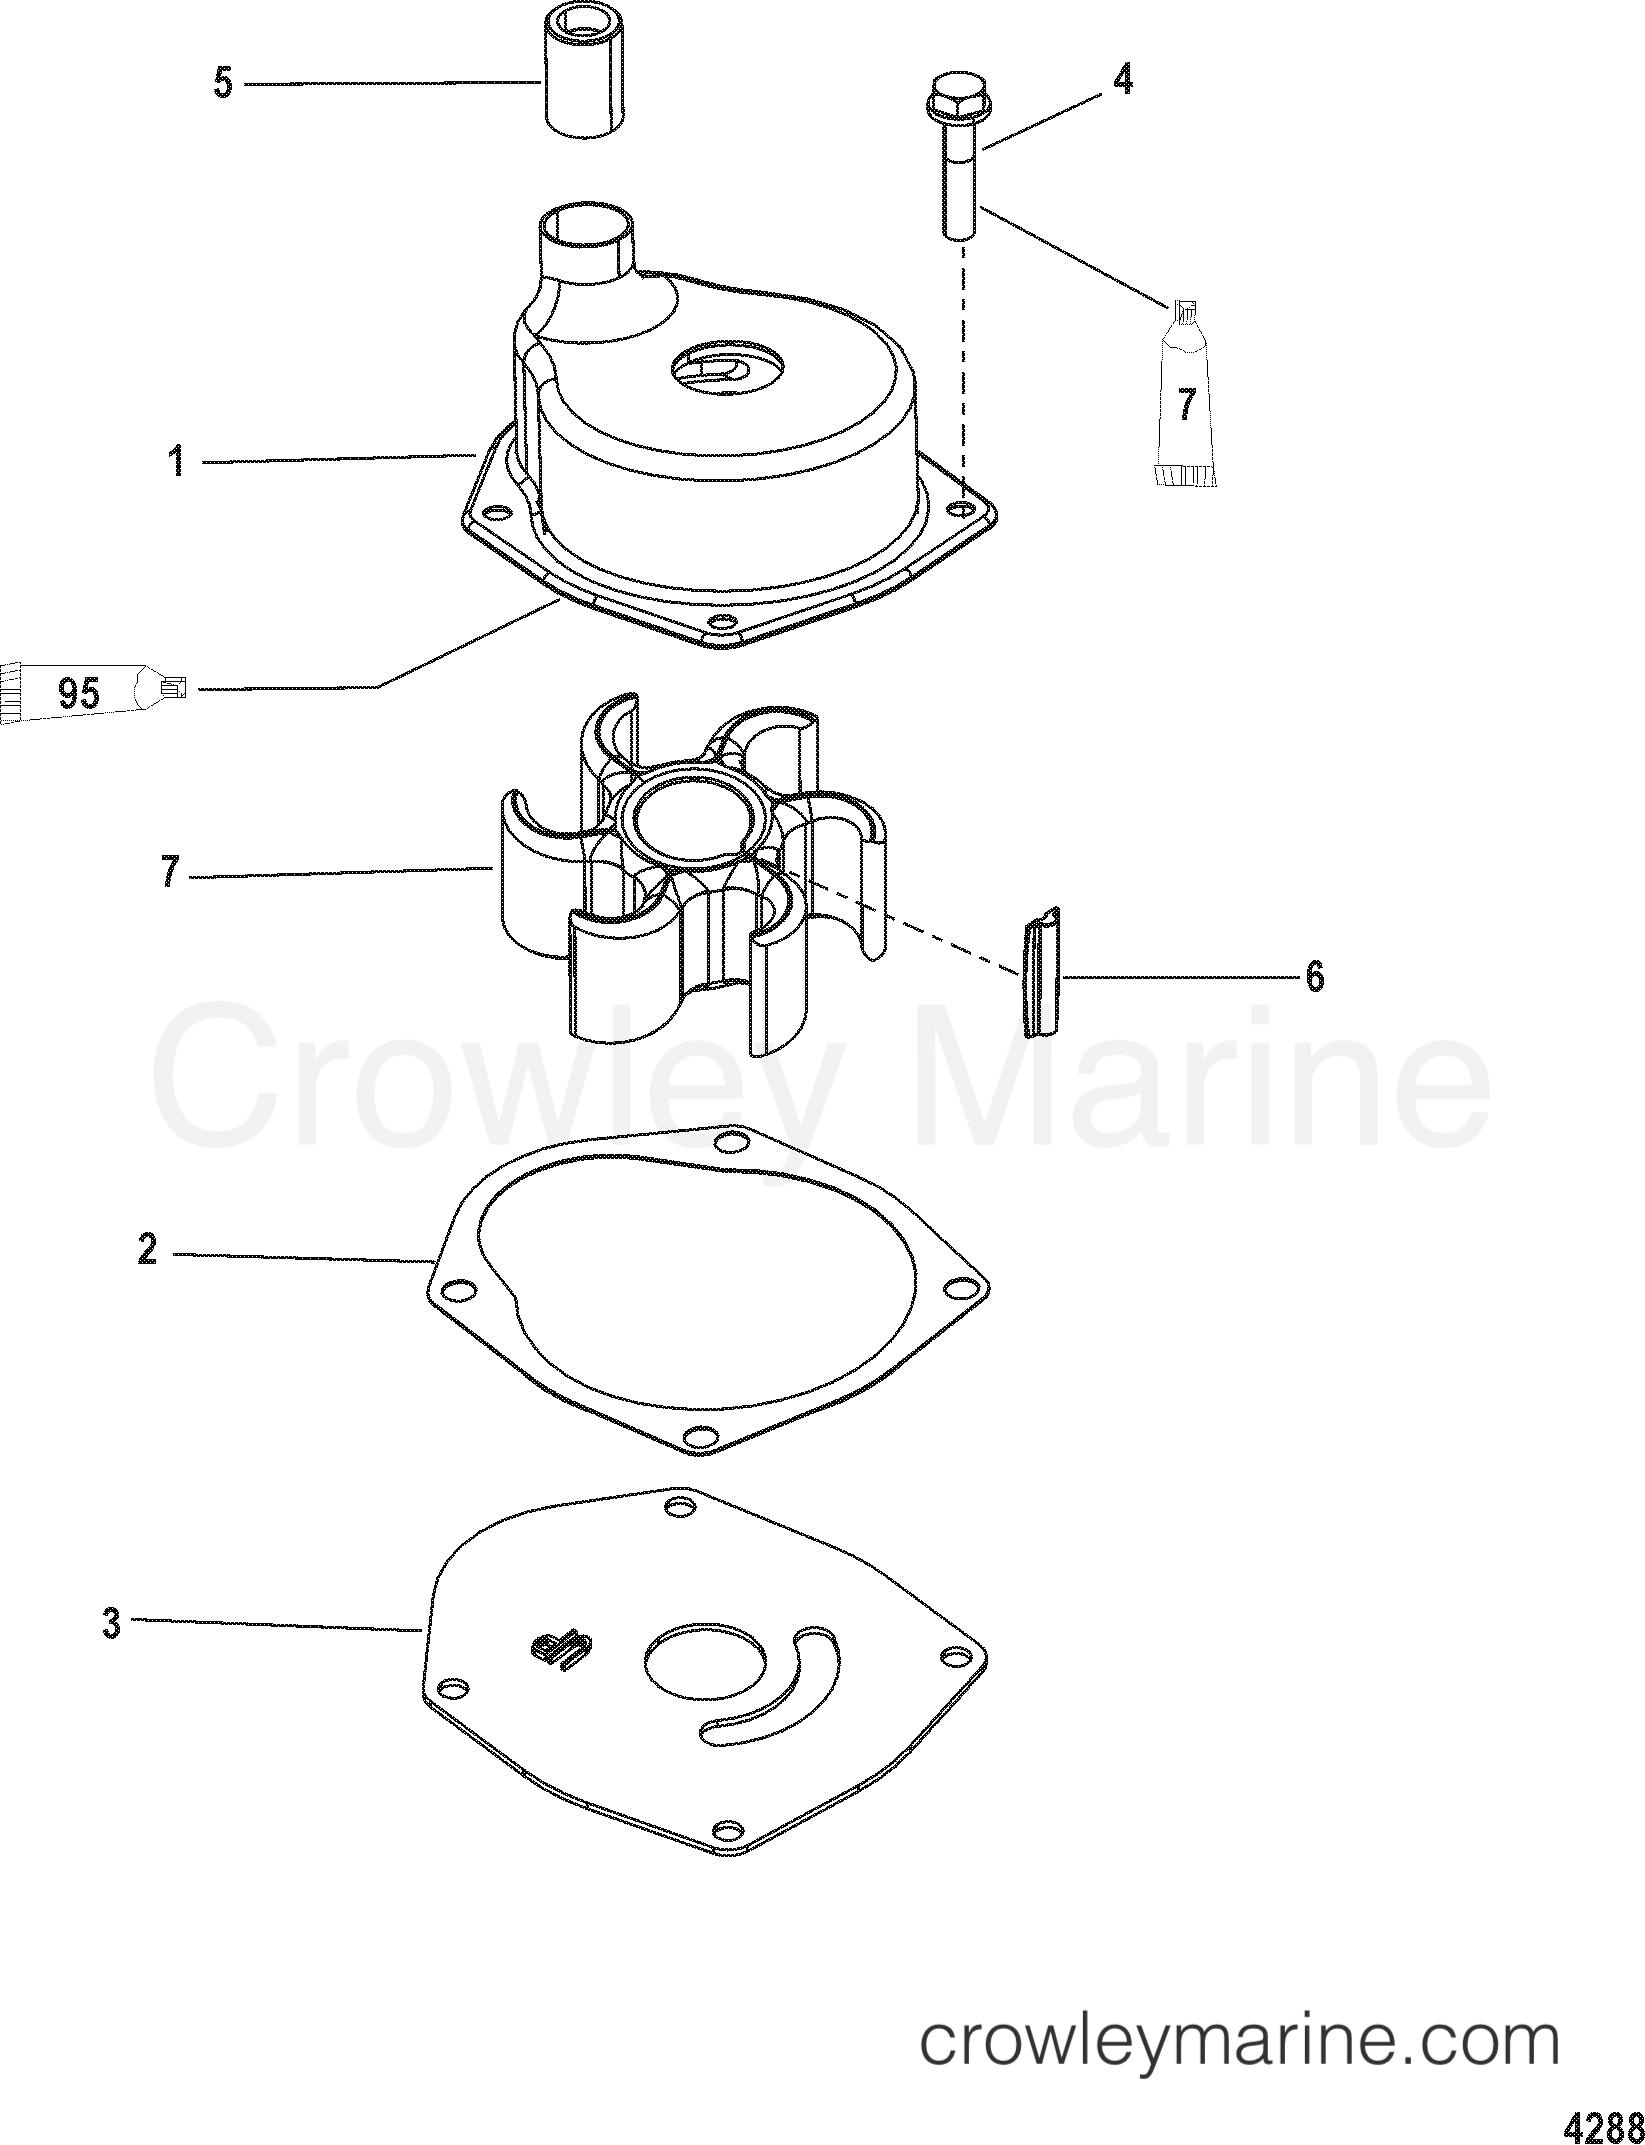 Serial Range Mercury Outboard 80 JET - 0P017000 THRU 0P325499 [BEL] - JET PUMP COMPONENTS section